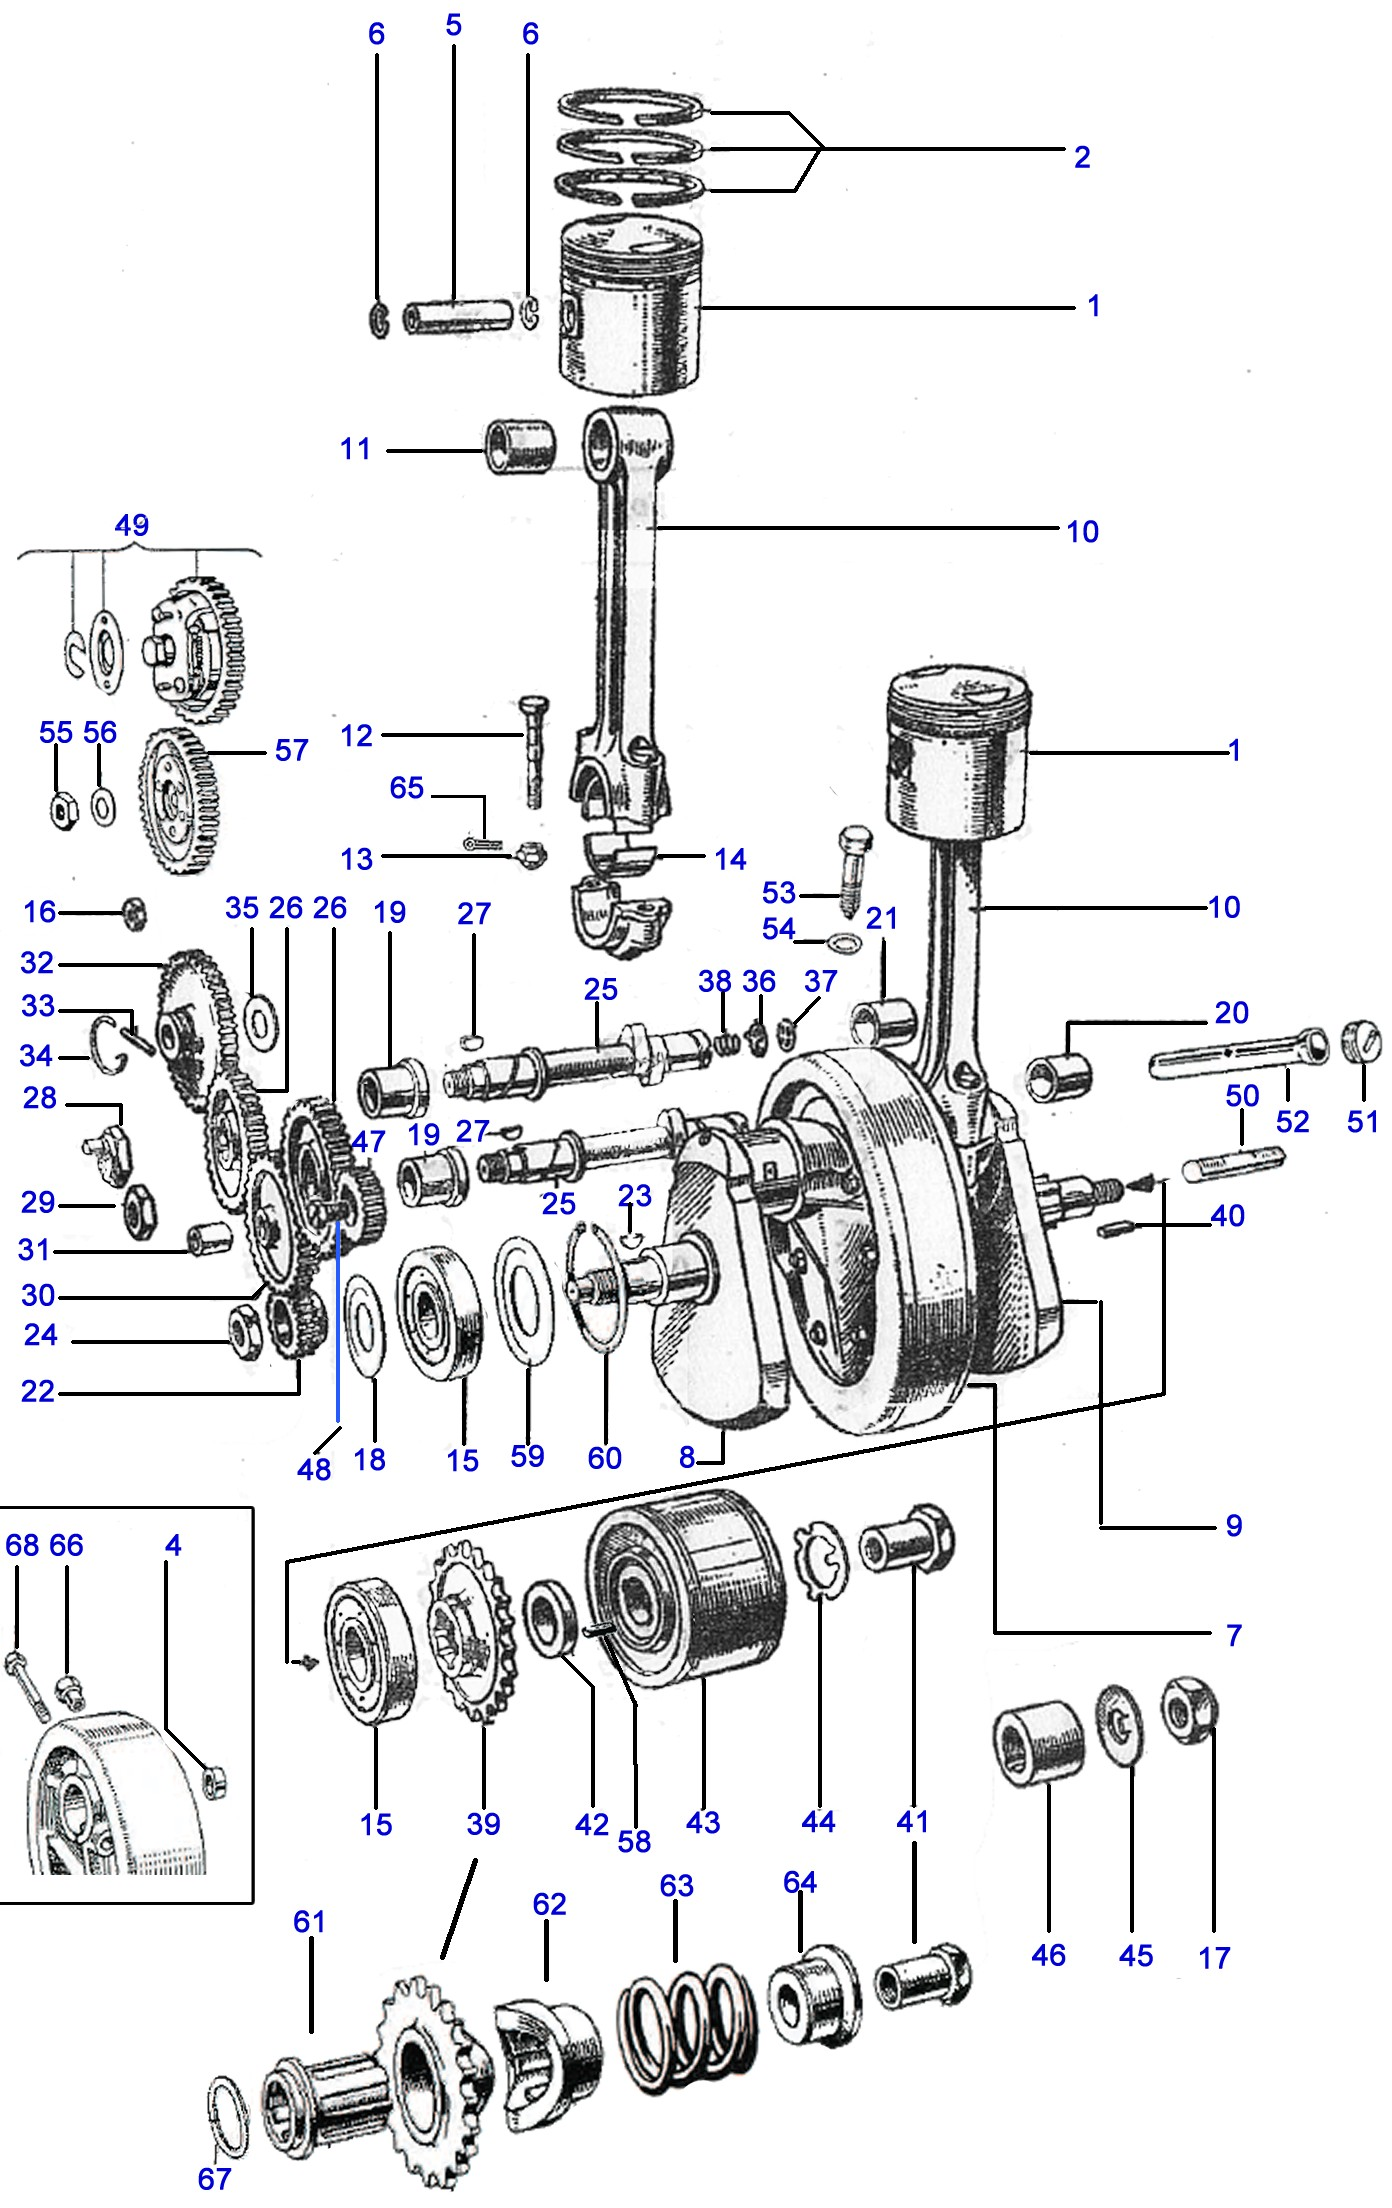 Bsa C15 Engine Diagram Crankcase My Wiring Diagram